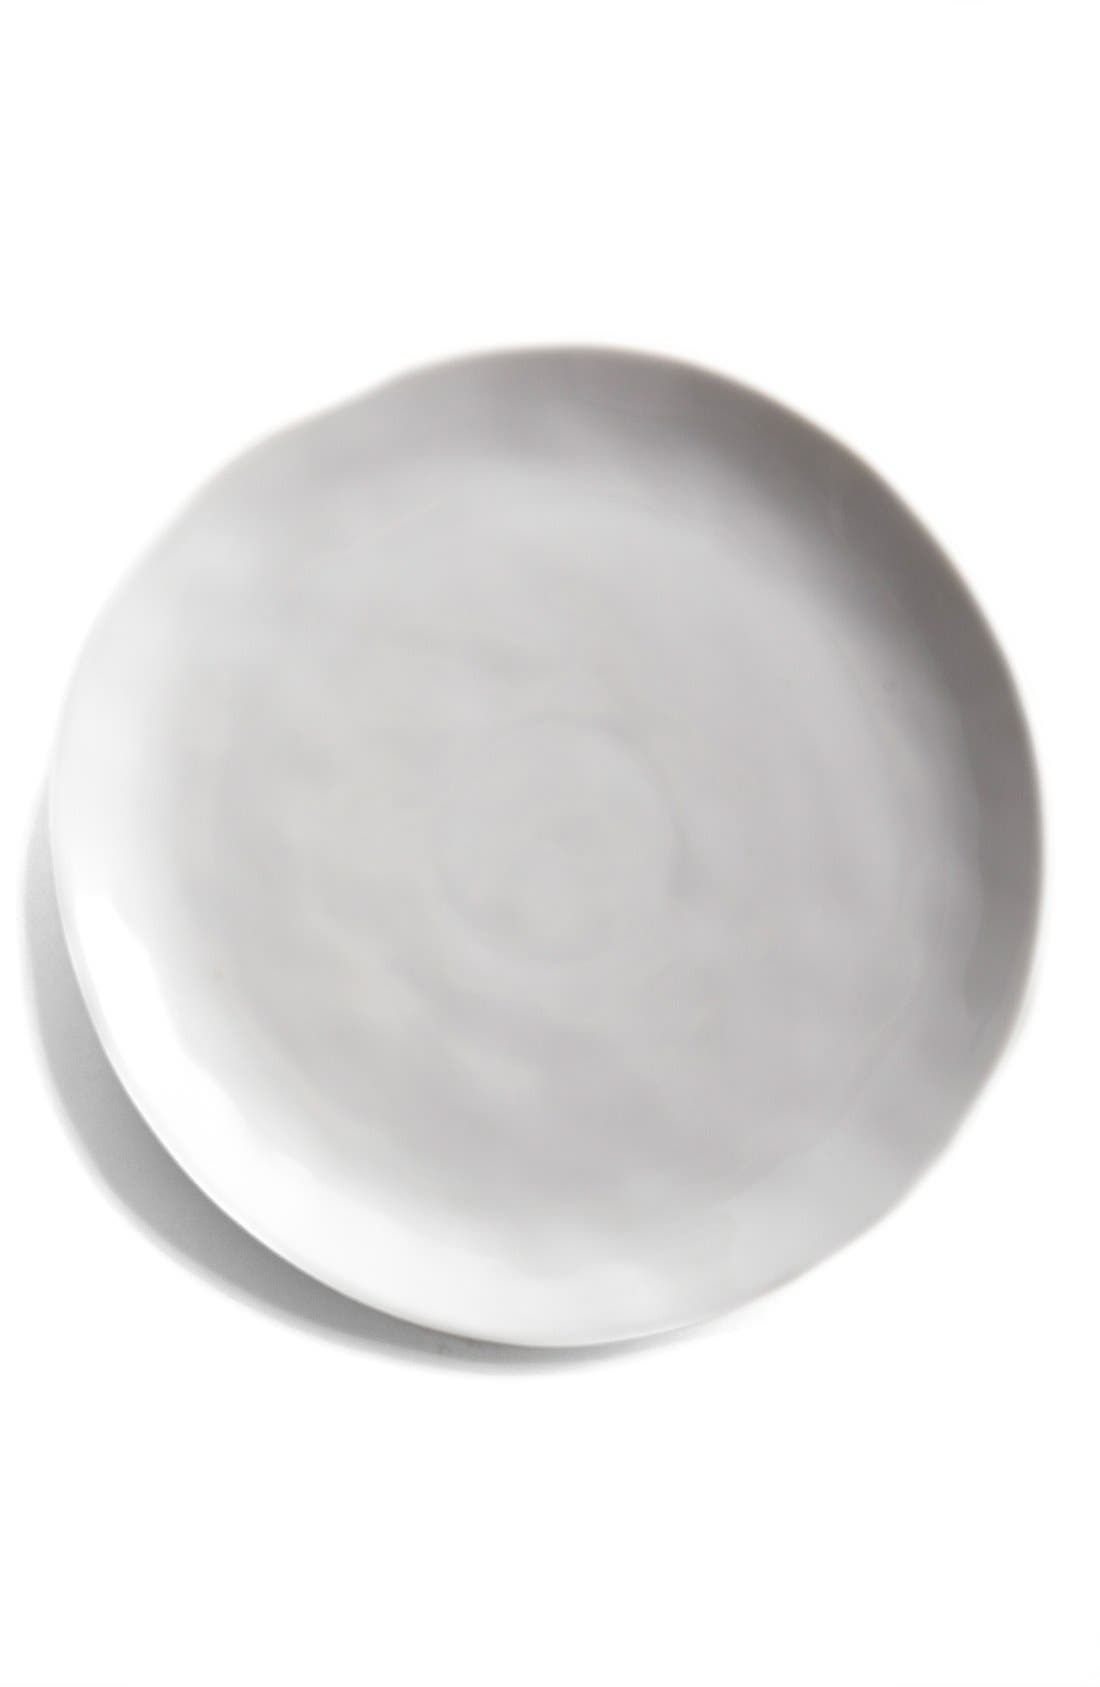 zestt 'Sculptured' Salad Plates (Set of 4)